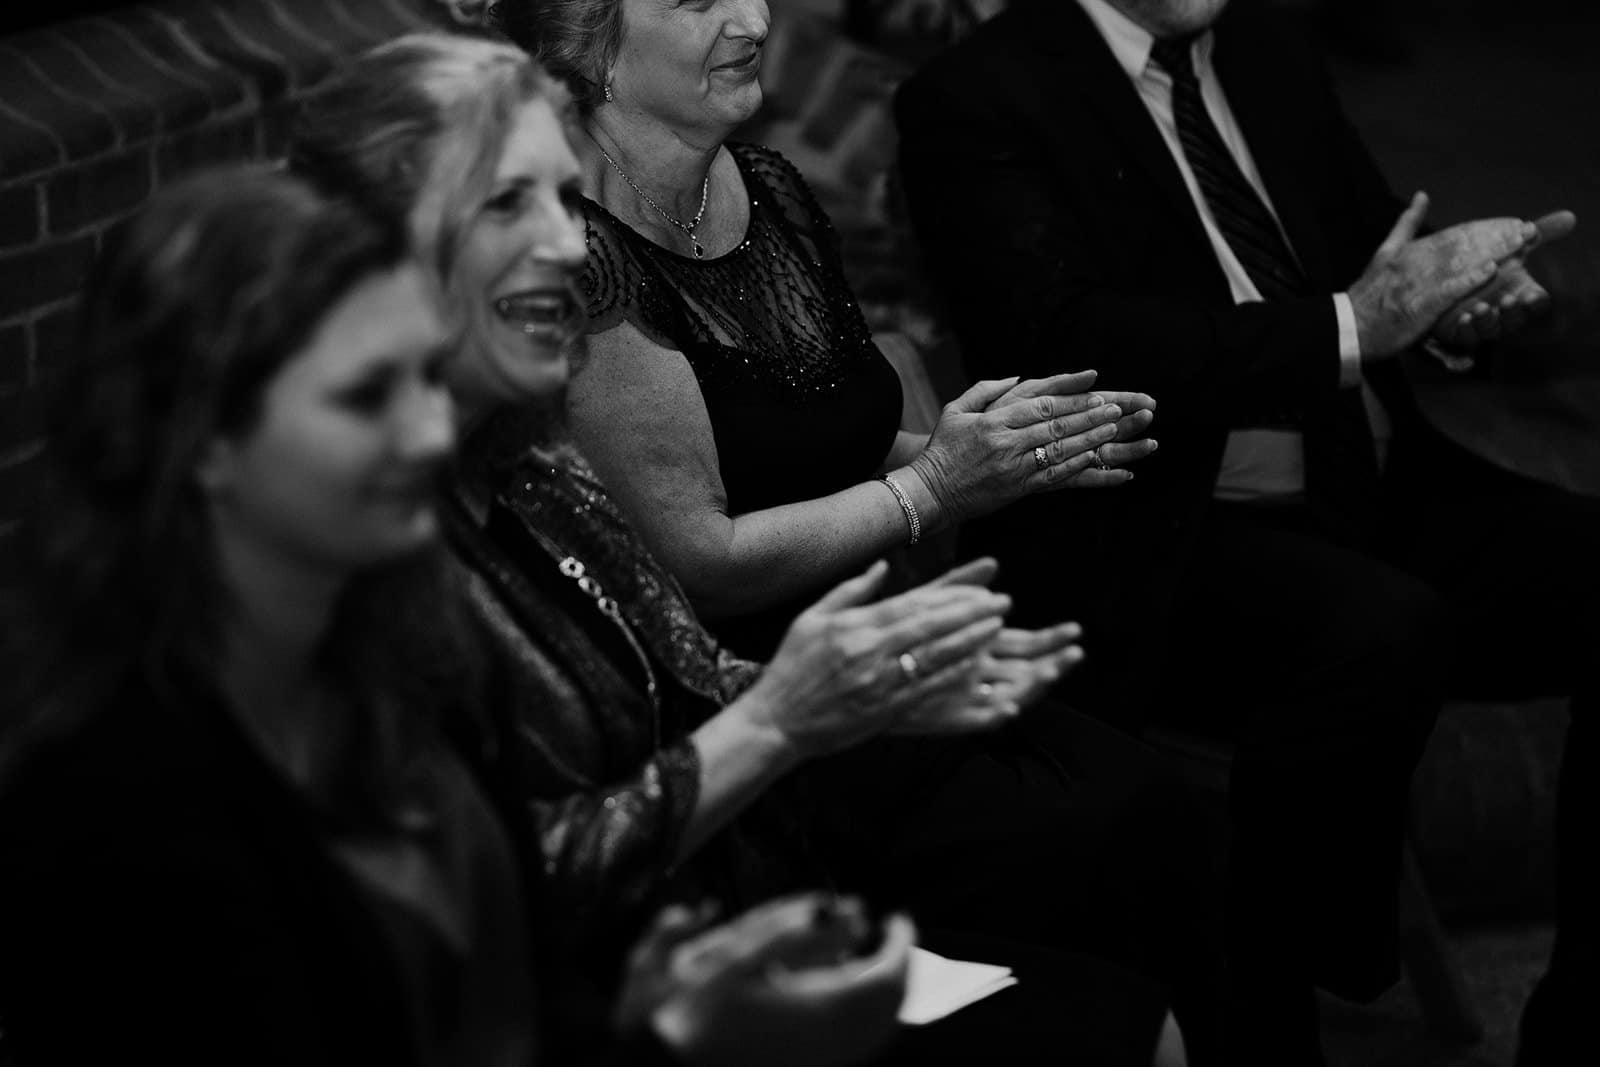 three women clap during wedding